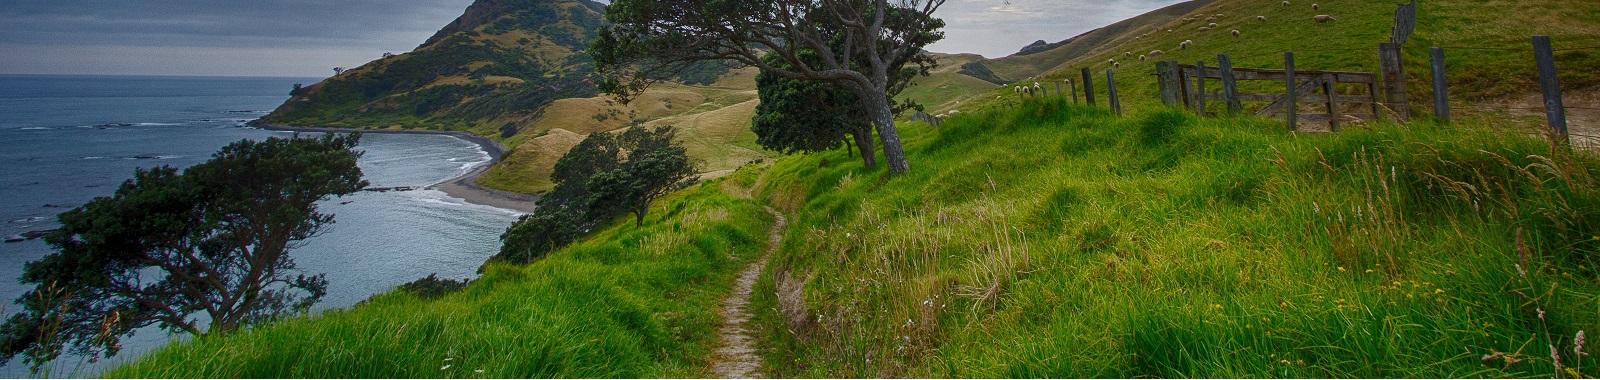 A path leading along the sea cliffs